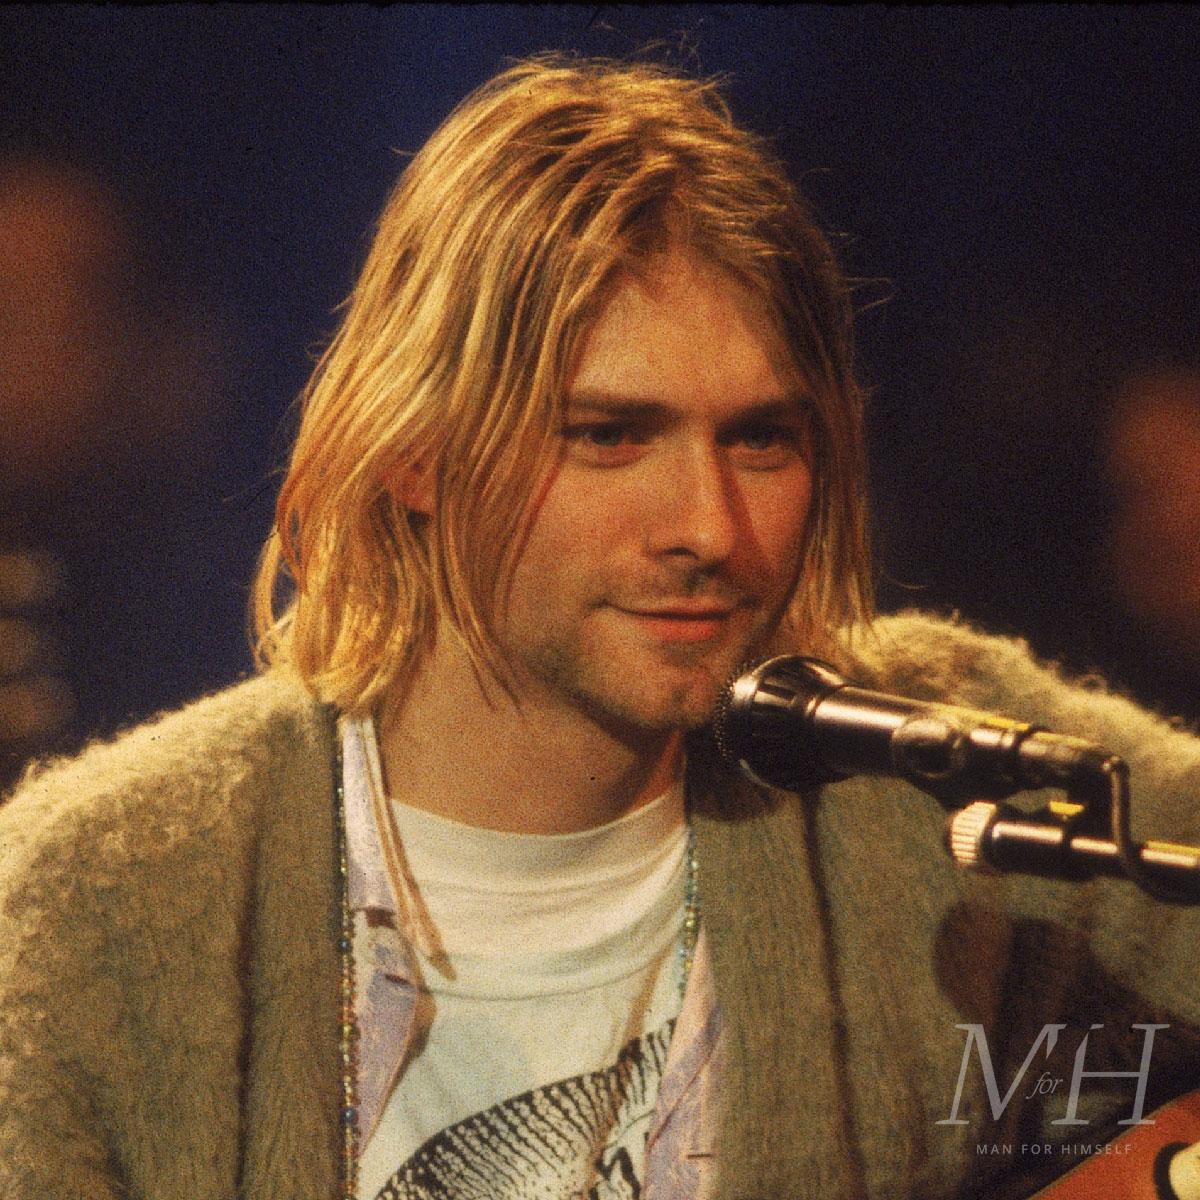 kurt cobain 90s long hair centre parting